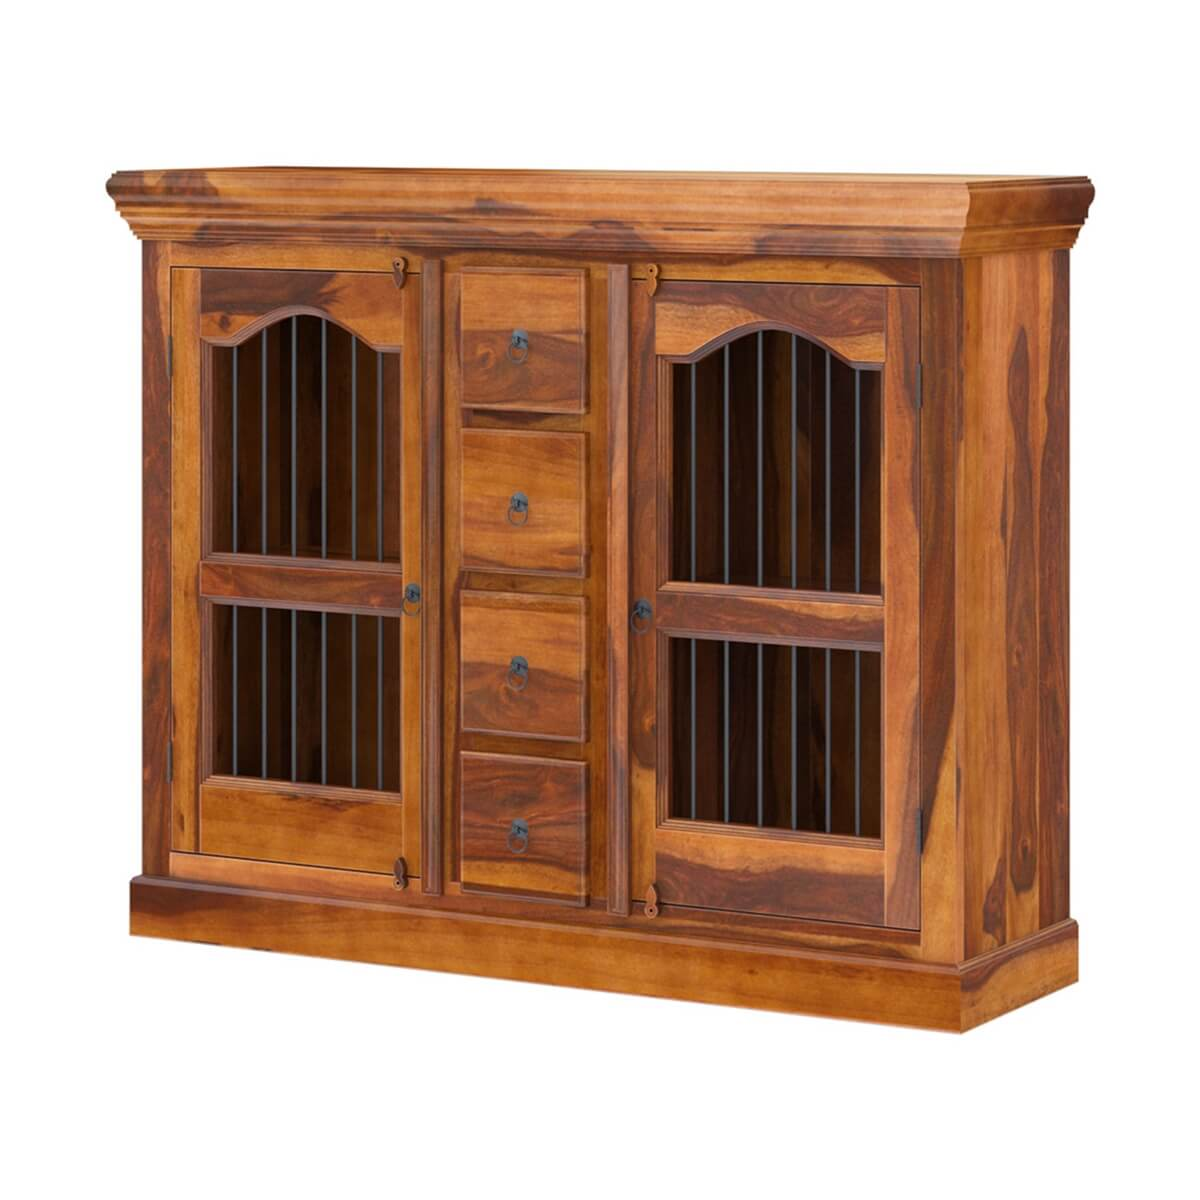 Arlington Handmade Solid Wood Dining Room 4 Drawer Credenza